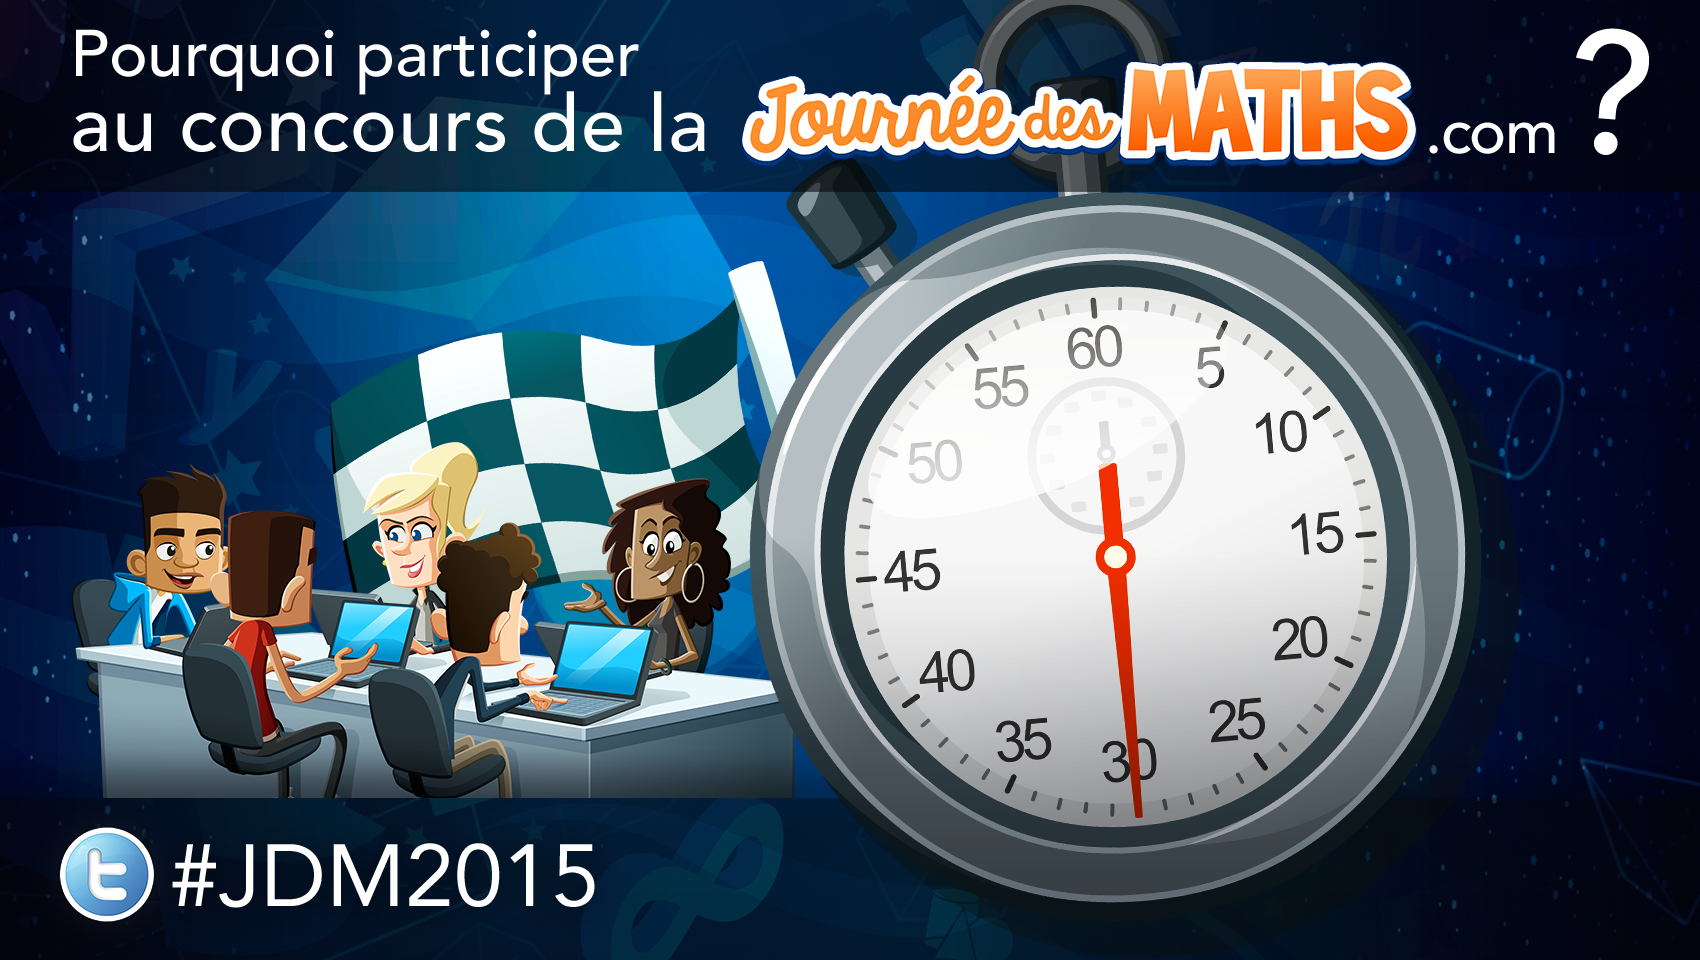 journee-des-maths-quebec-ontario-mathematiques-1